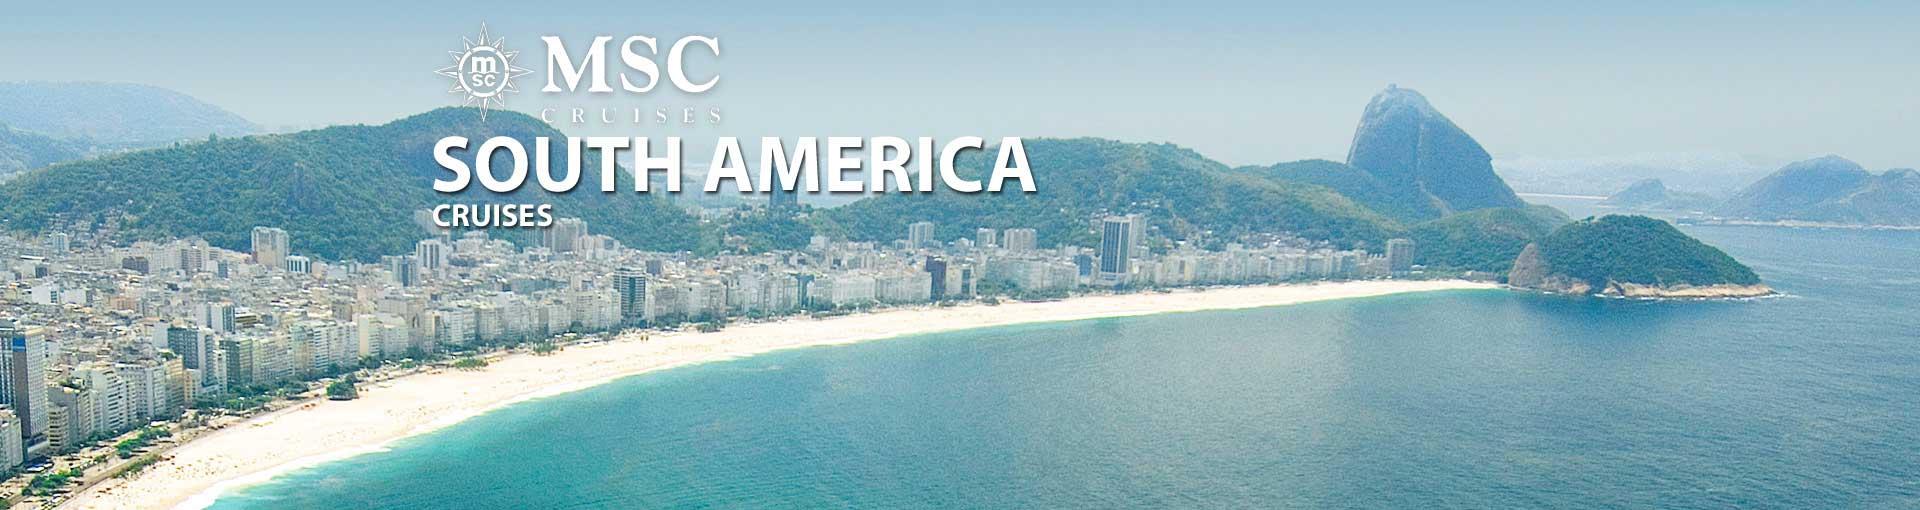 MSC Cruises South America Cruises